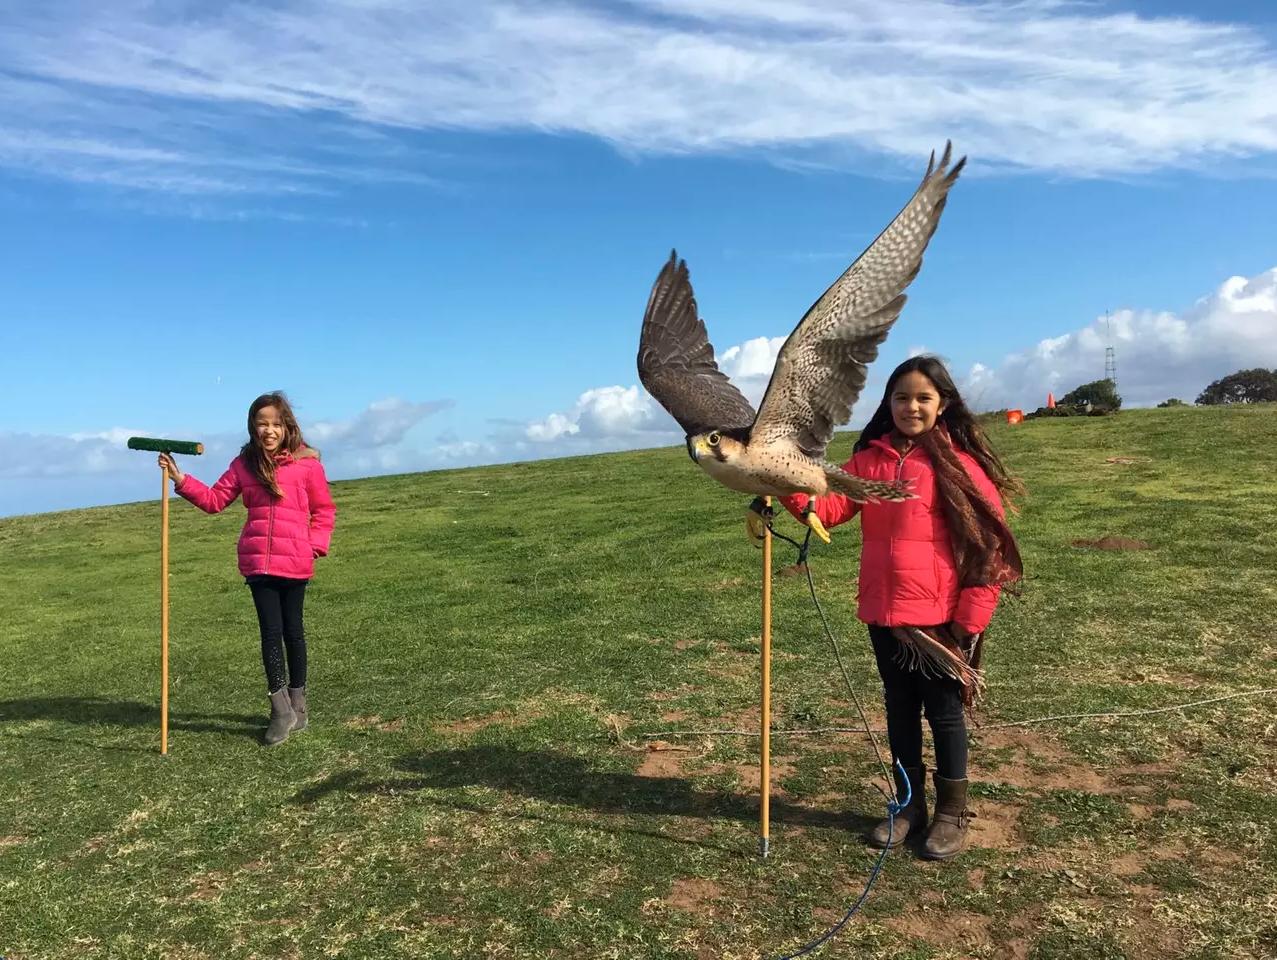 Falcon Flight Encounter